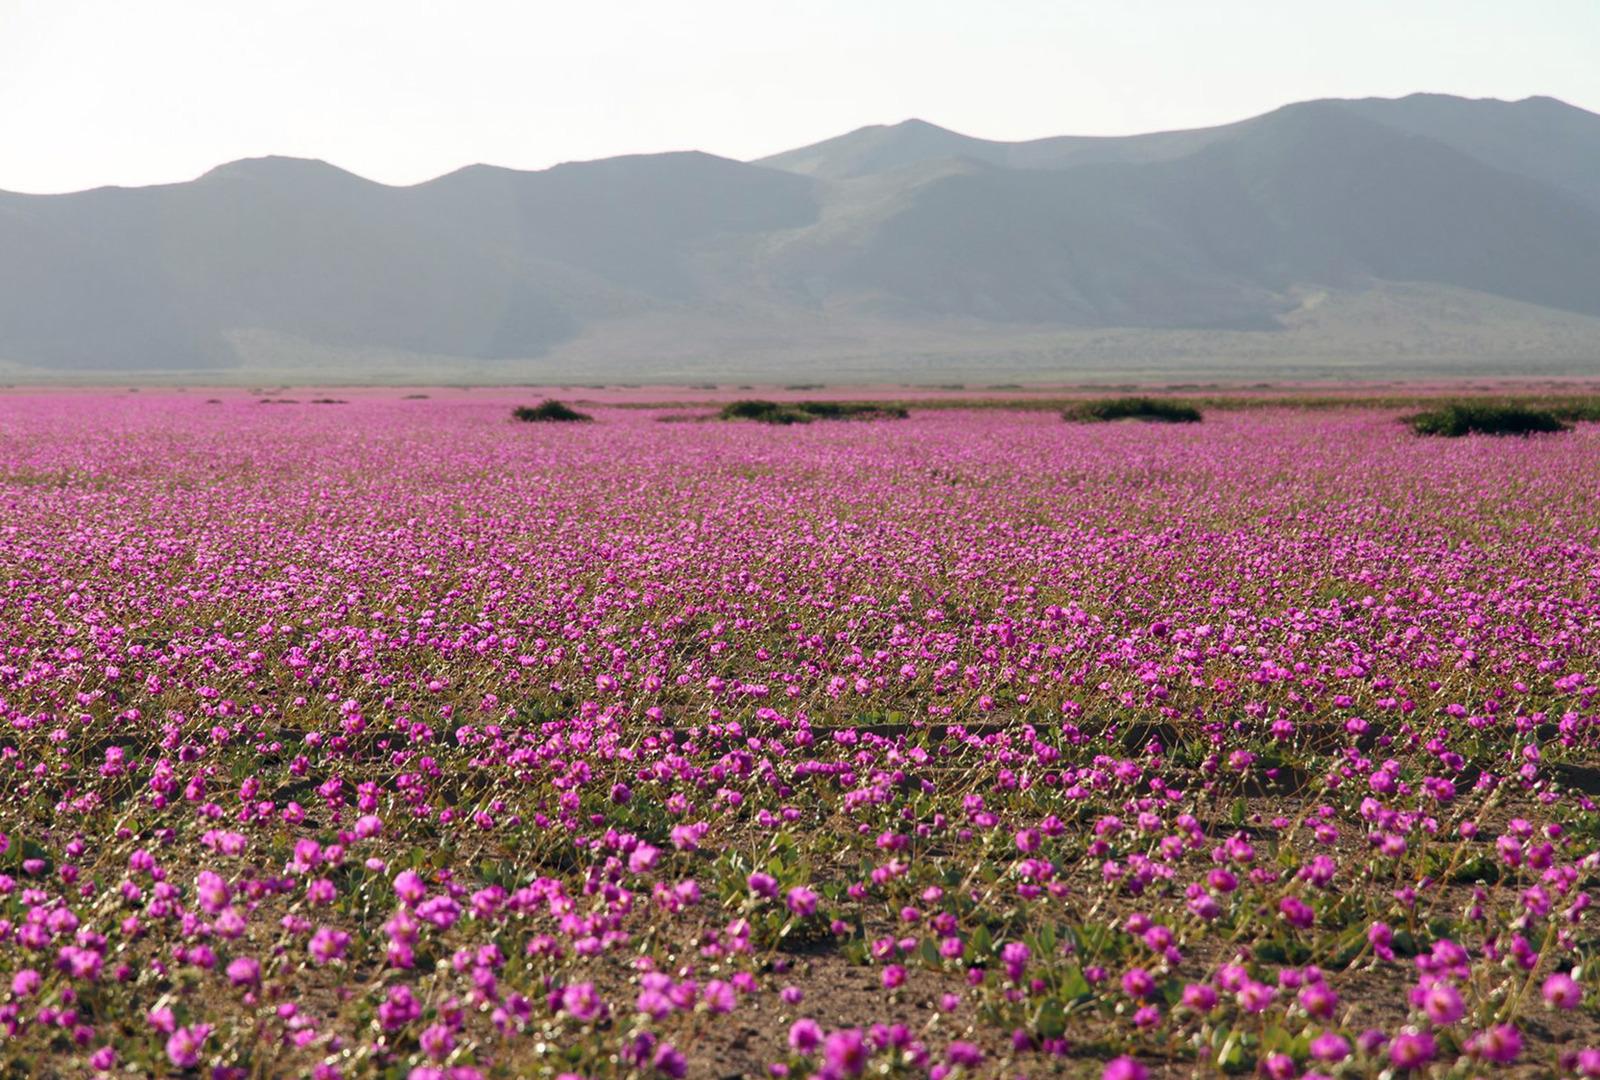 CHILE-DESERT-BLOOMING